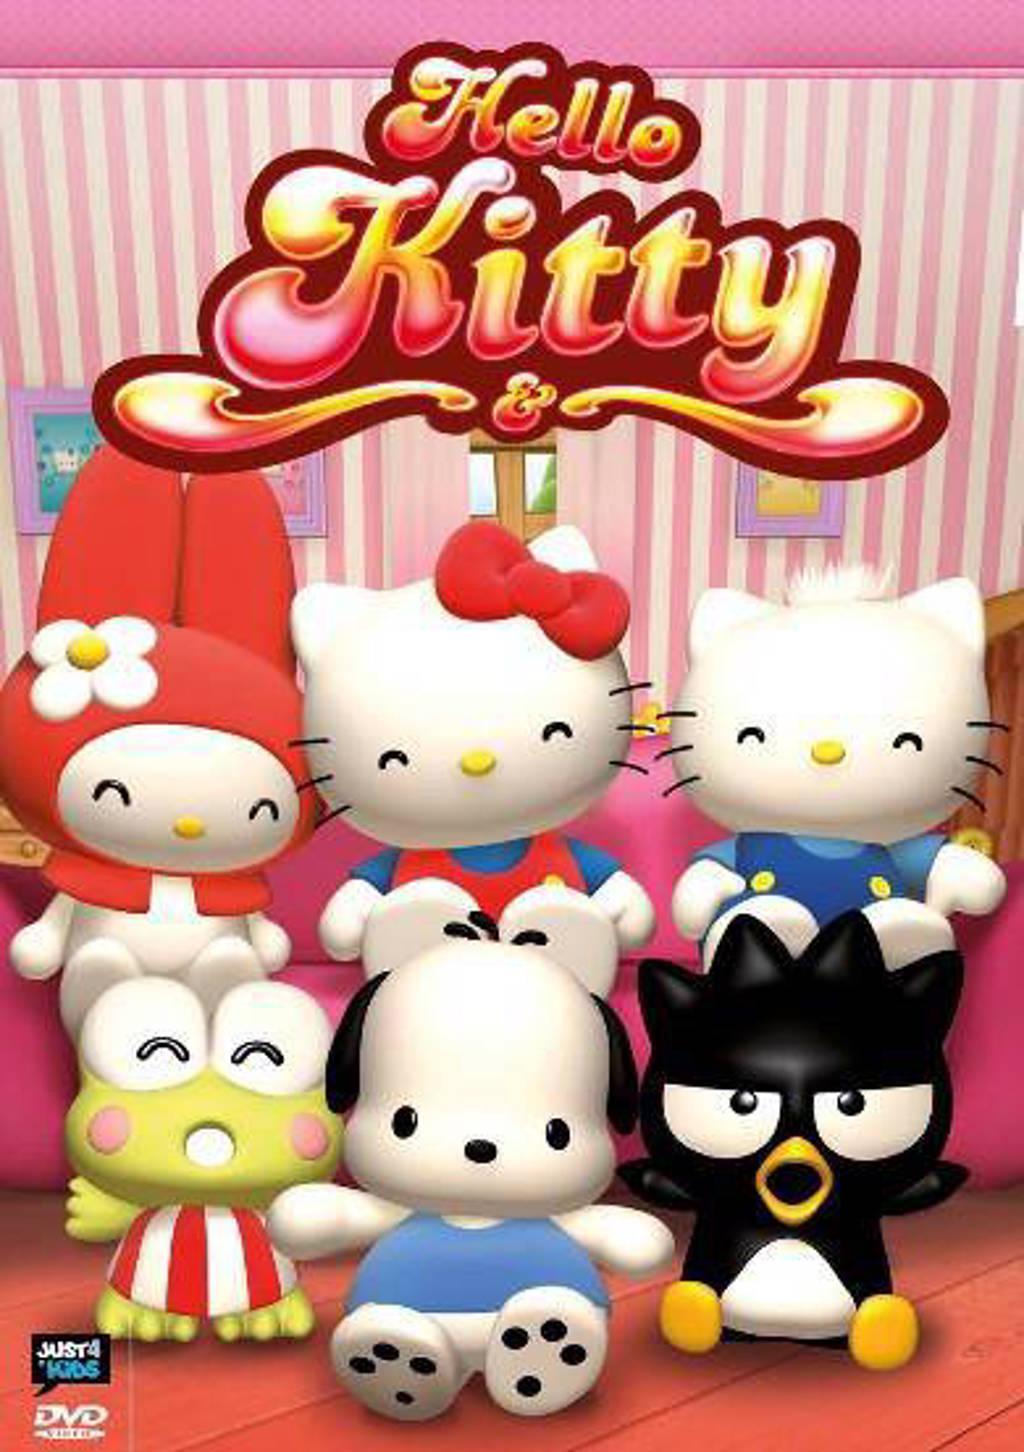 Hello Kitty - Deel 1 (DVD)